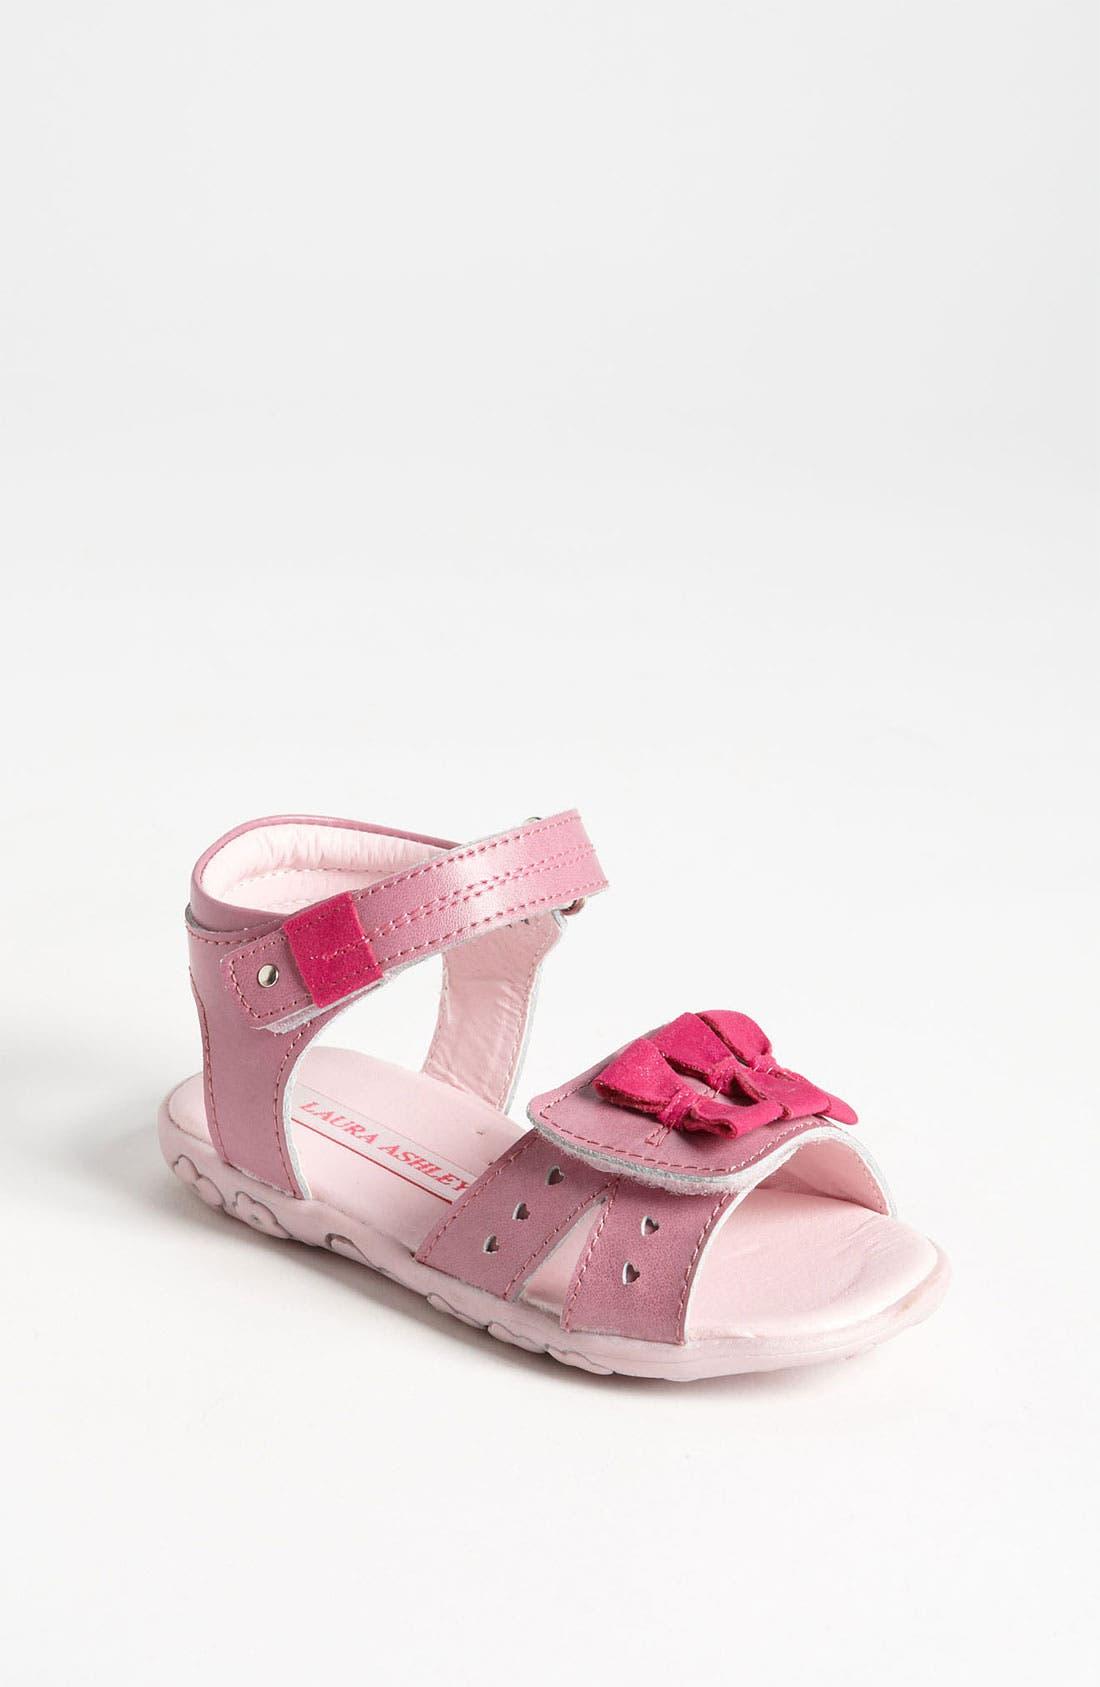 Main Image - Laura Ashley 'Bow' Sandal (Walker & Toddler)